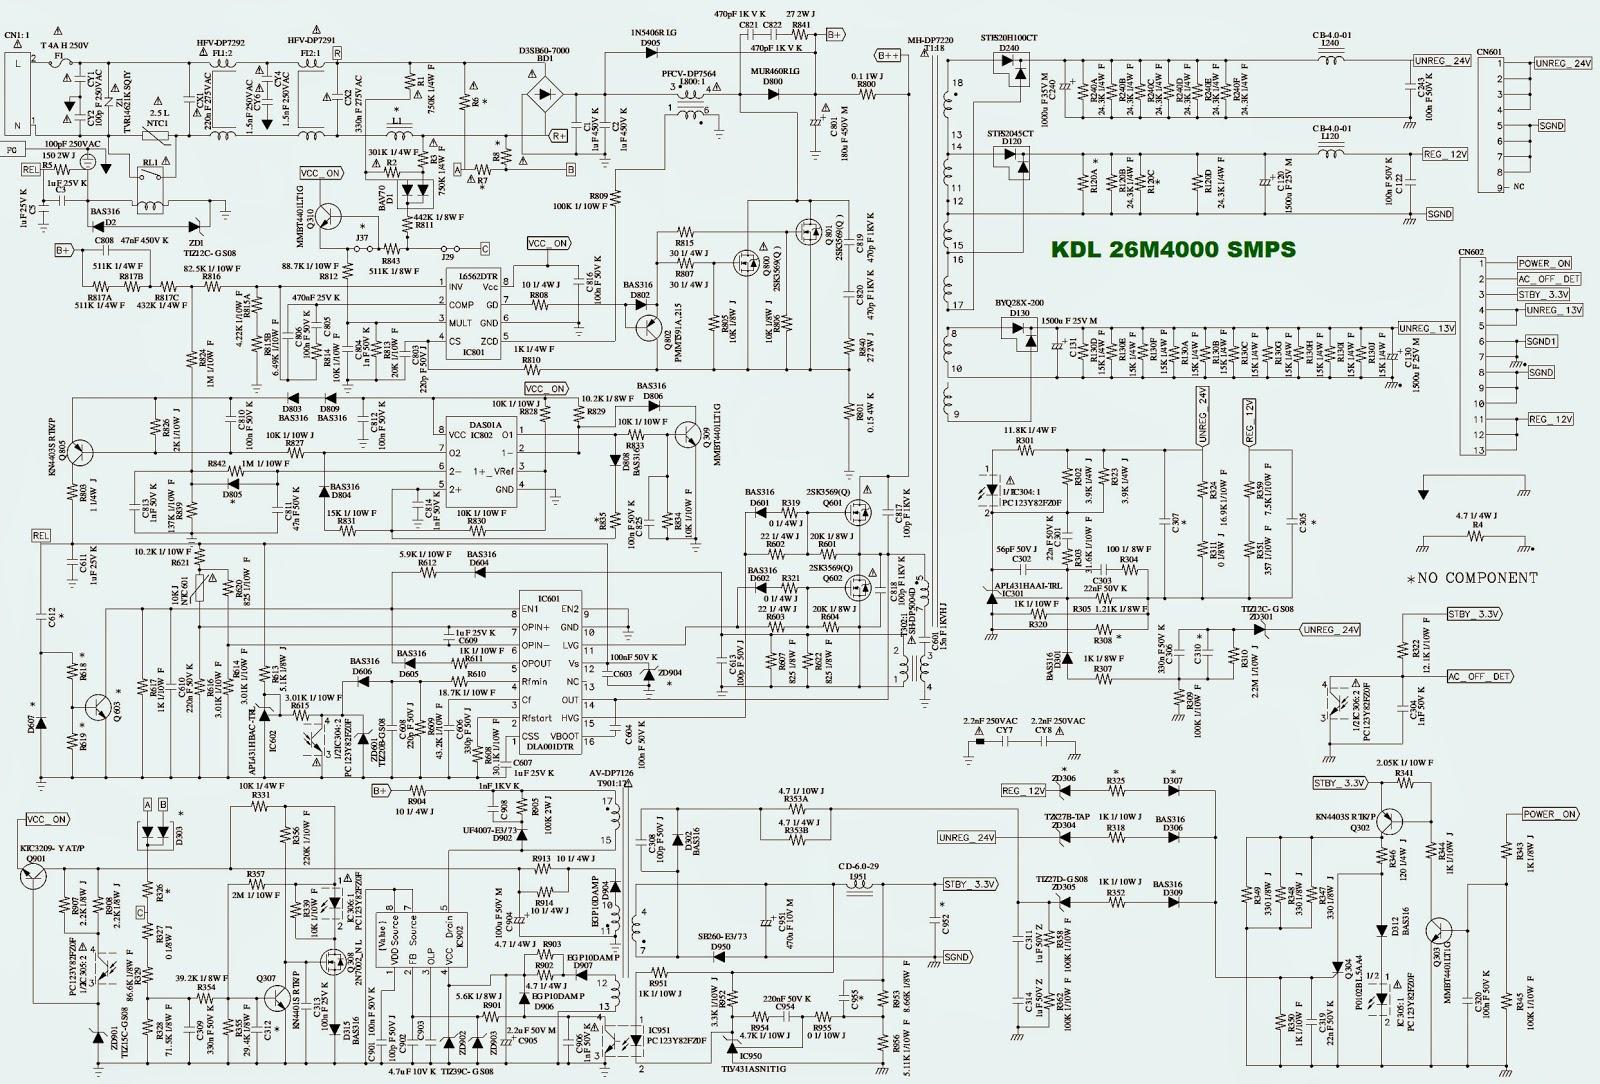 Parrot Ck3100 Wiring Diagram Also Lutron Dimmer Switch Wiring